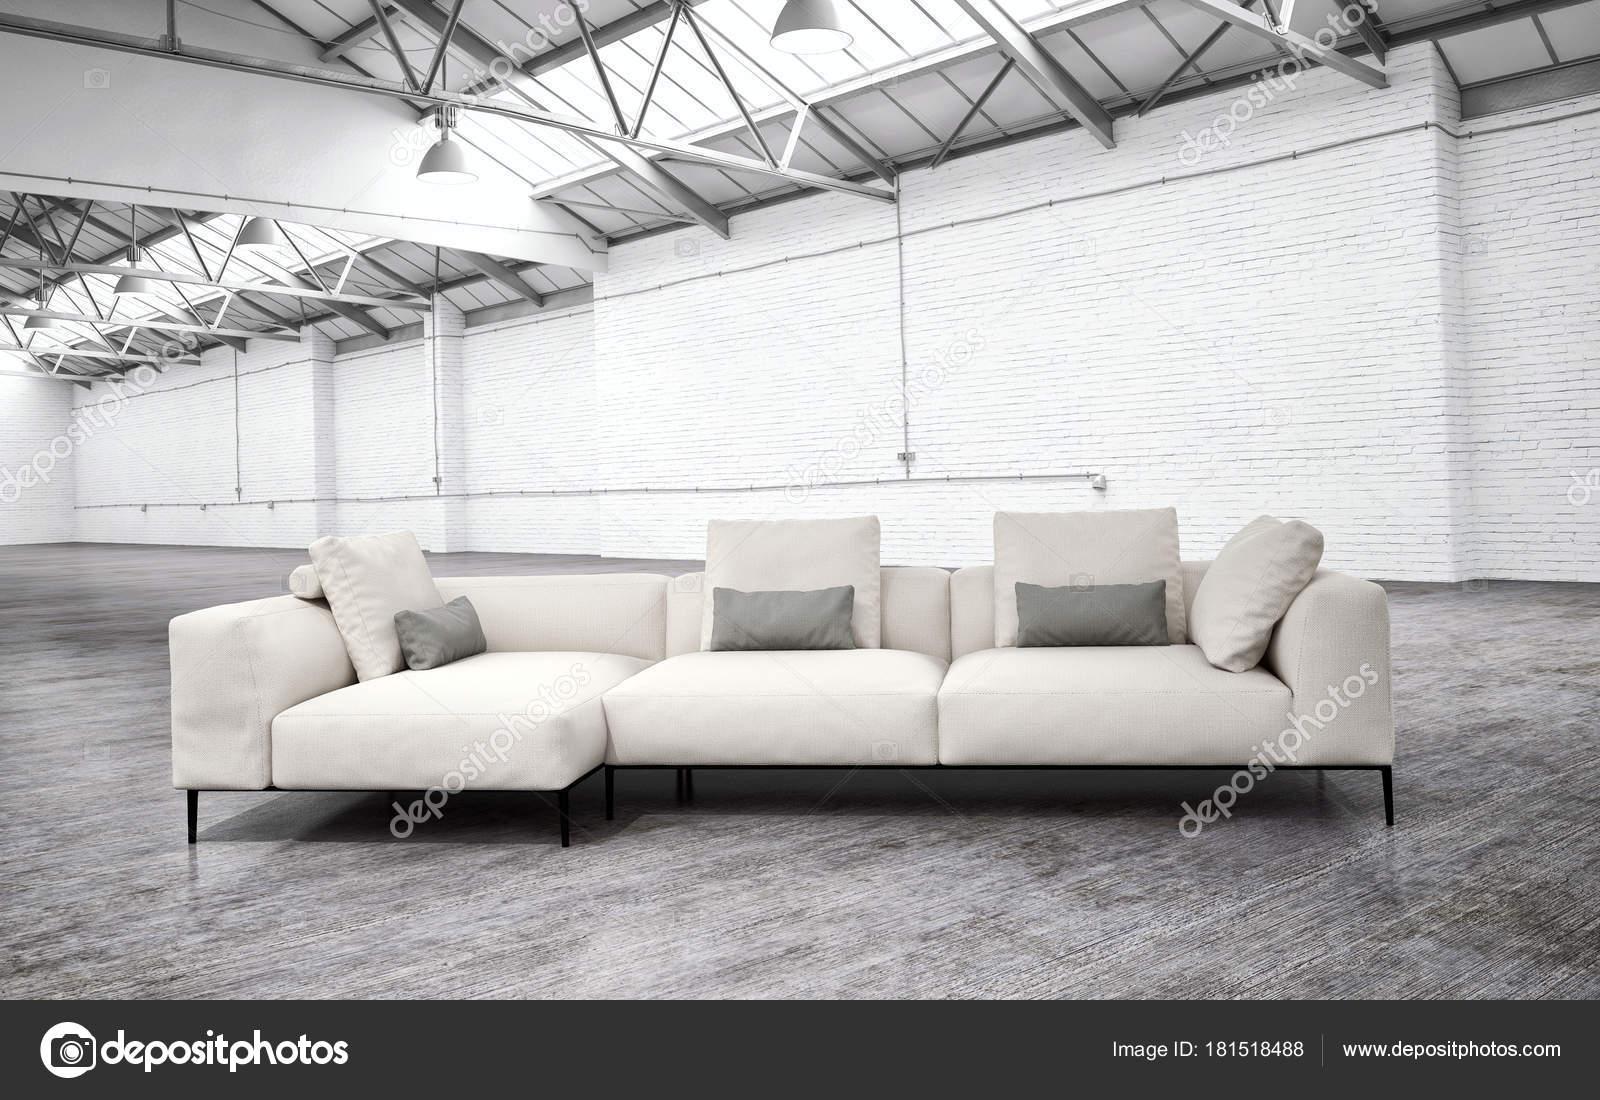 https://st3.depositphotos.com/15869754/18151/i/1600/depositphotos_181518488-stockafbeelding-moderne-interieurs-3d-rendering-illustratie.jpg